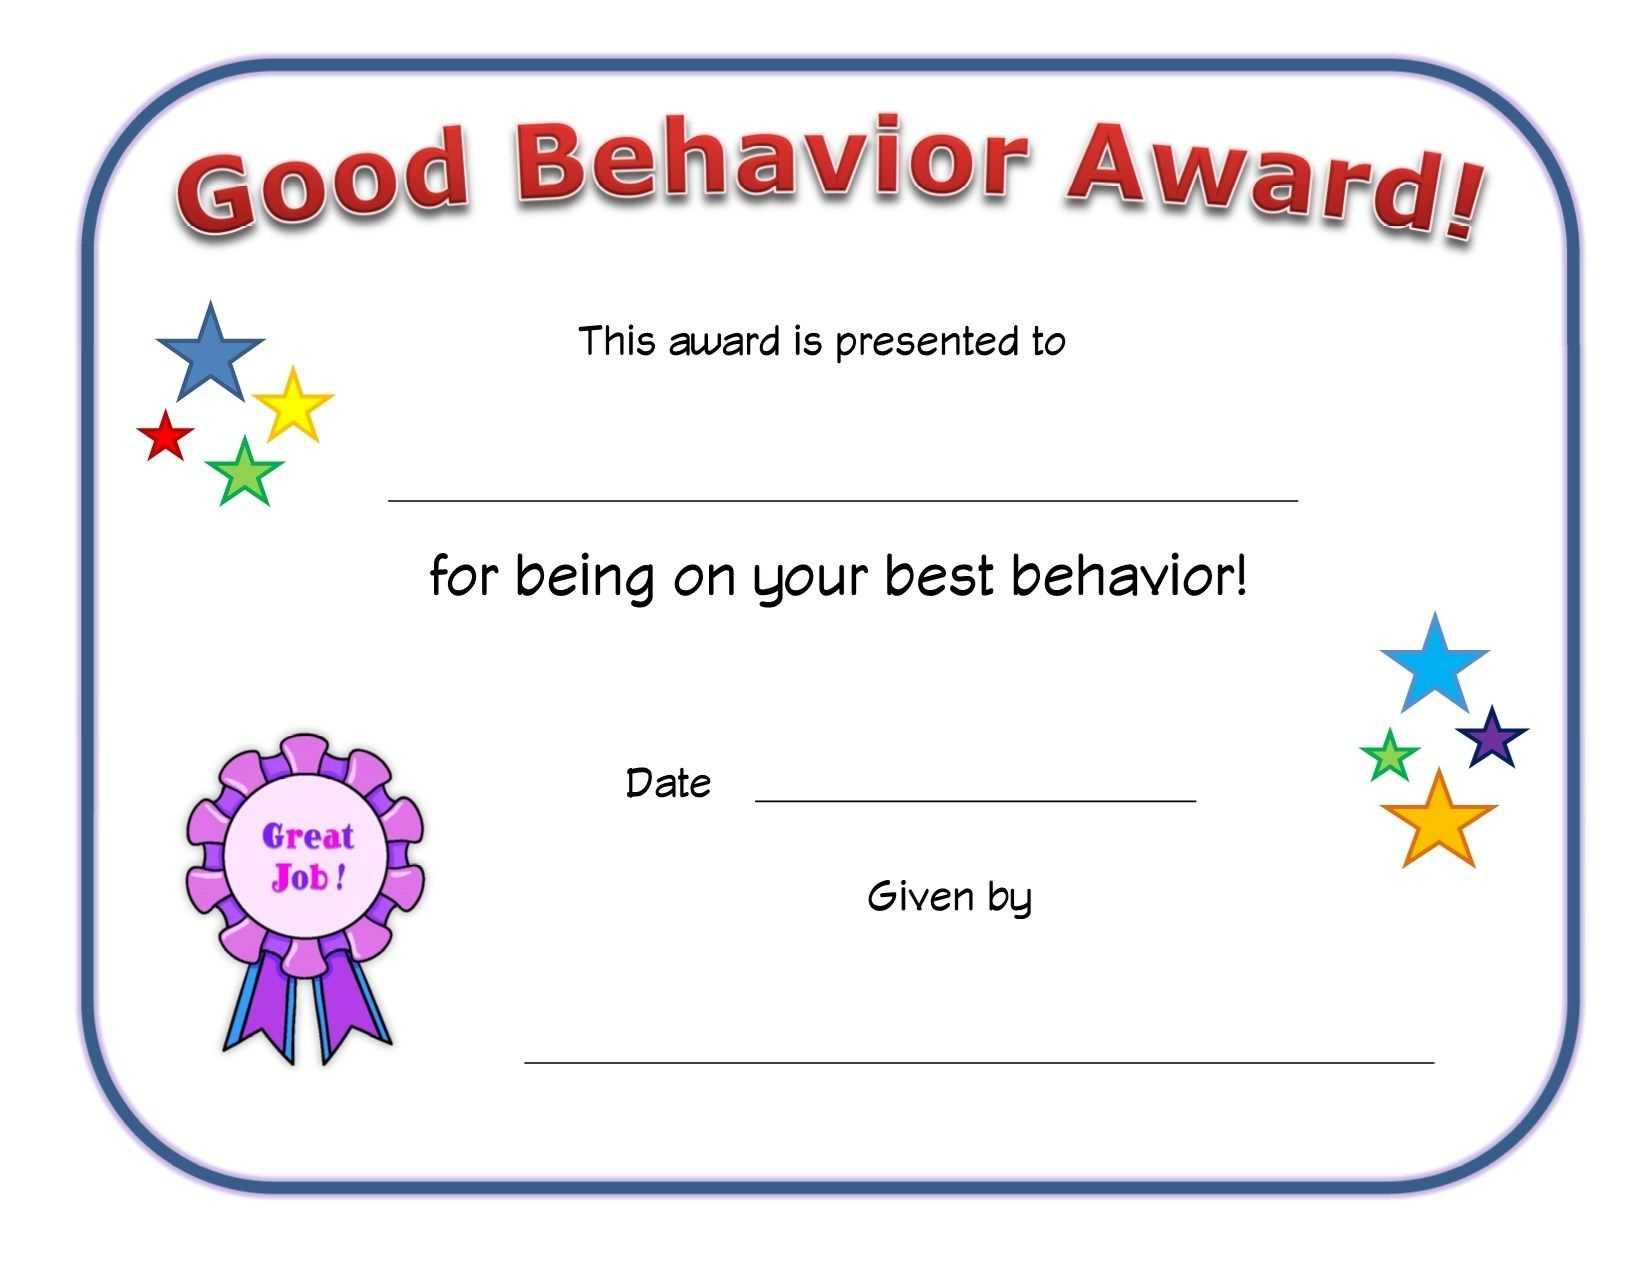 Good Behavior Award Certificate | Printable Certificates inside Good Job Certificate Template